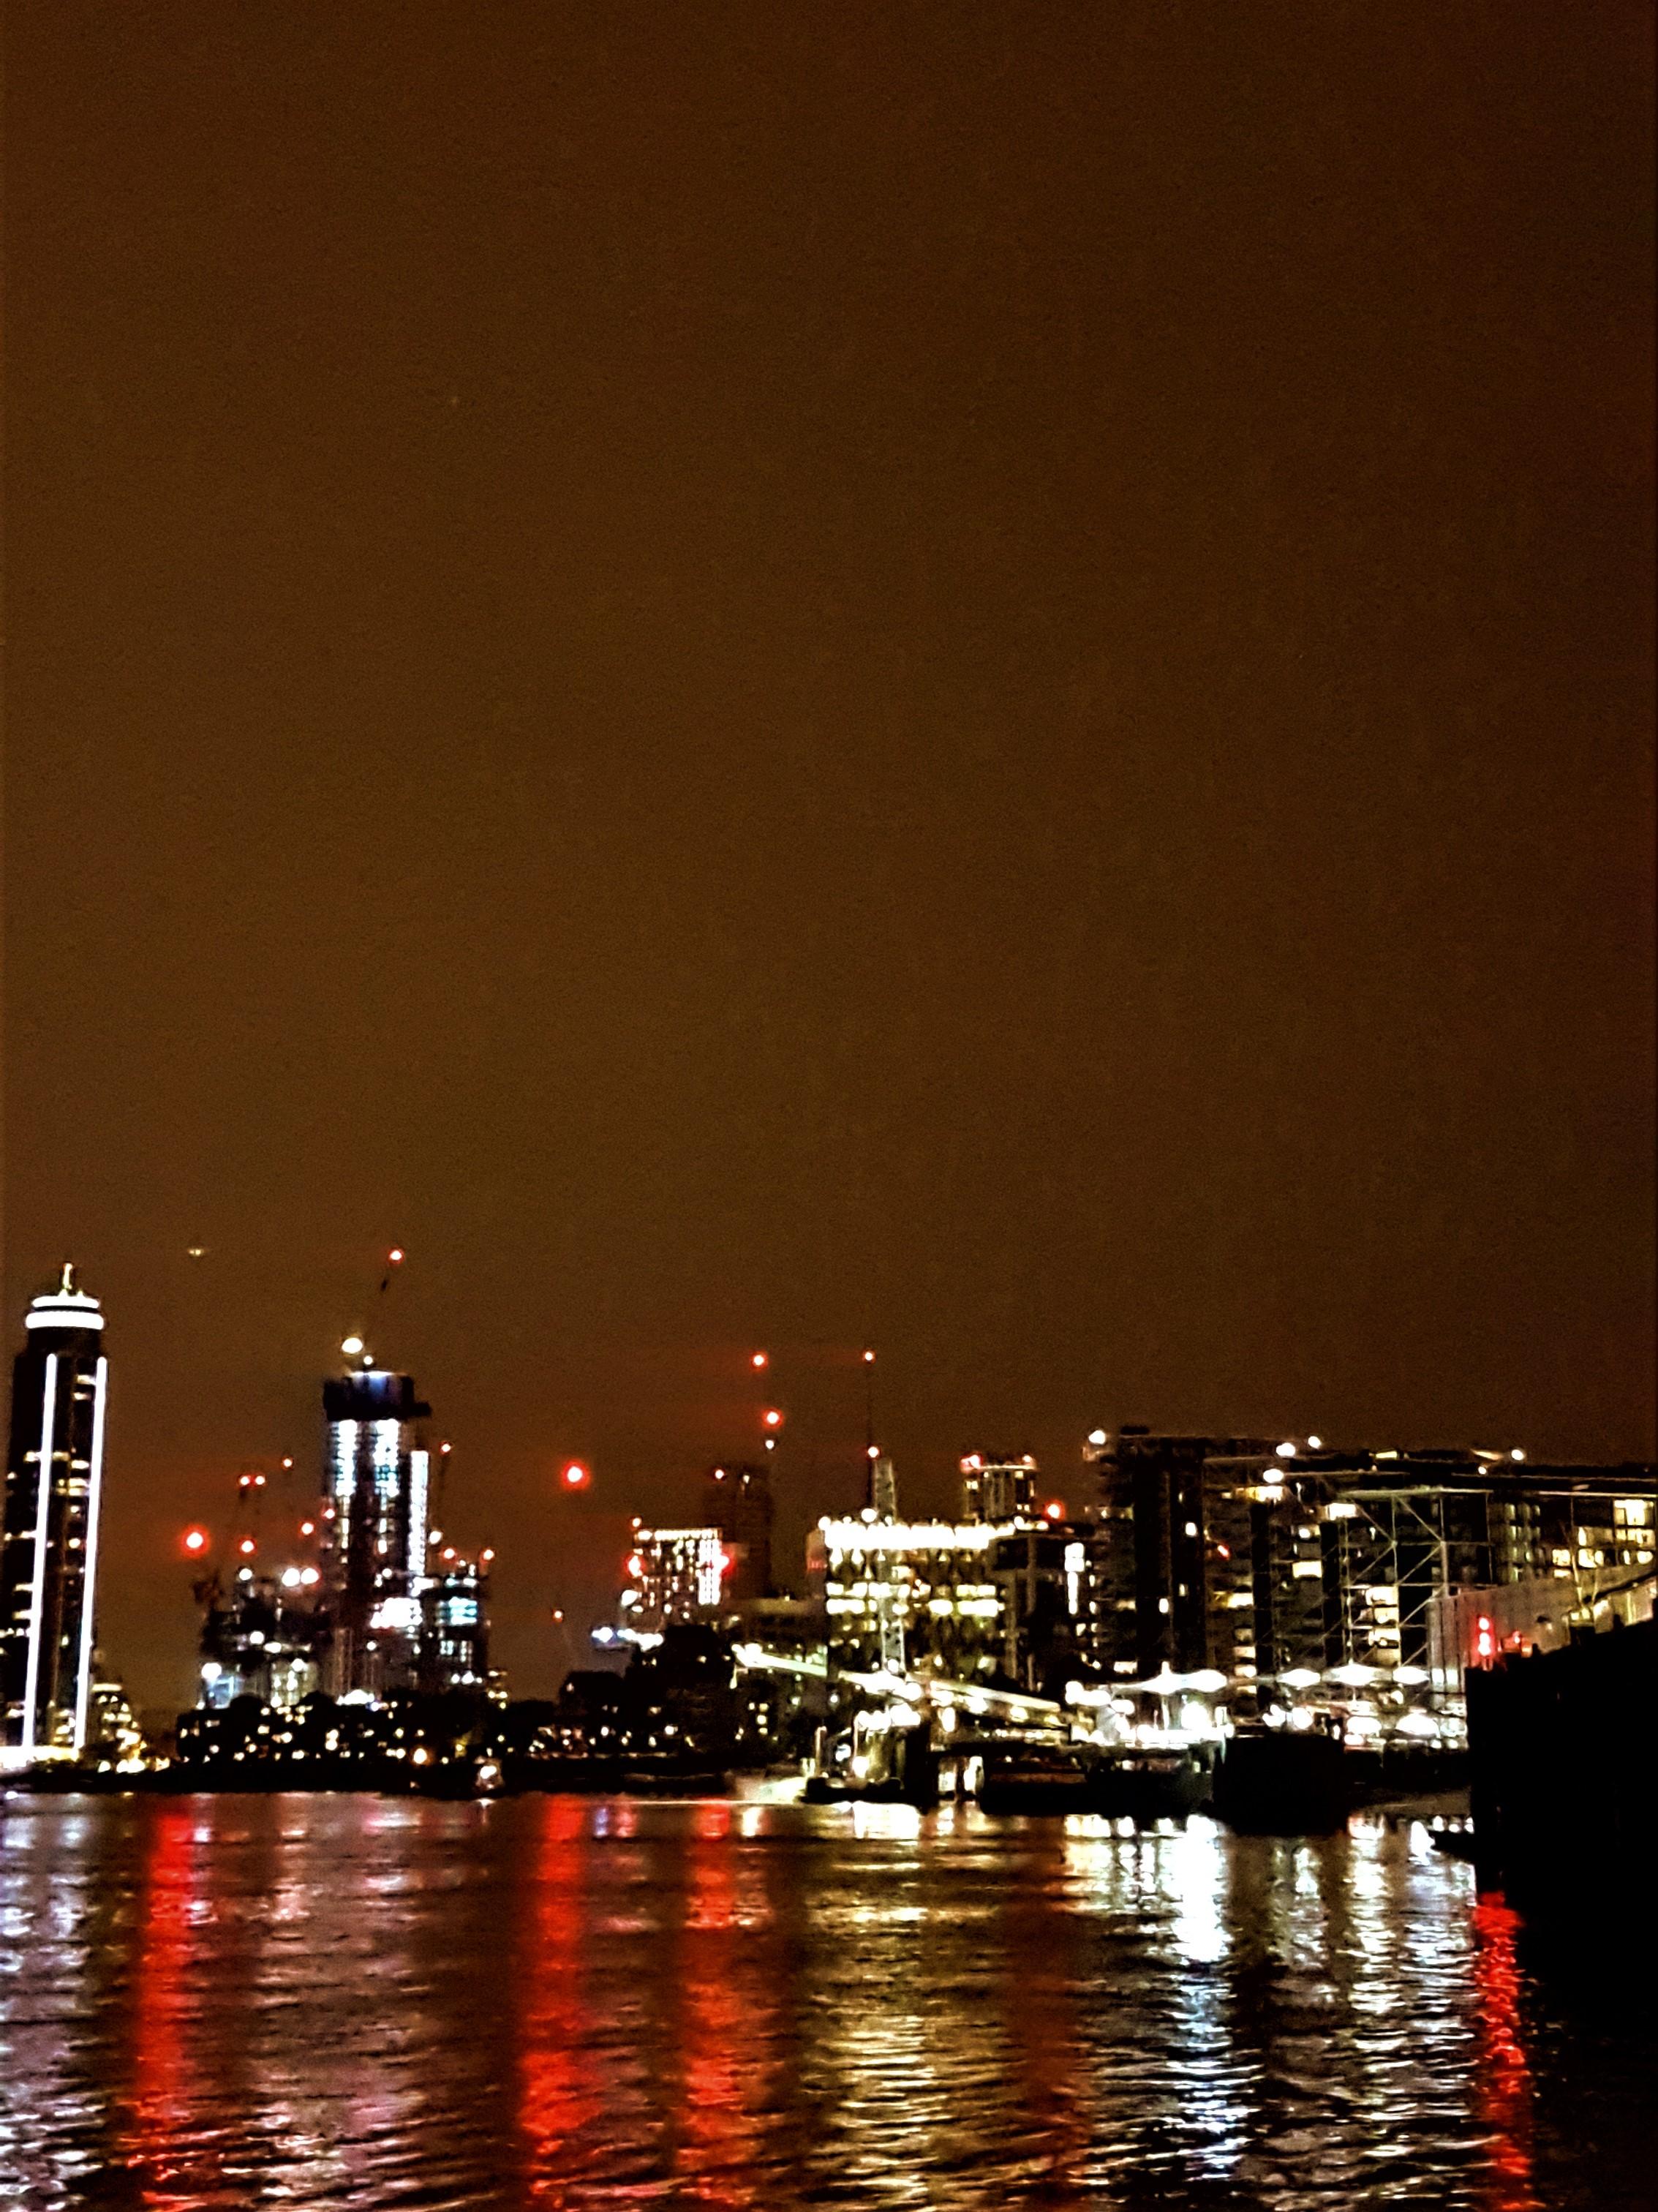 Candystripe Thames